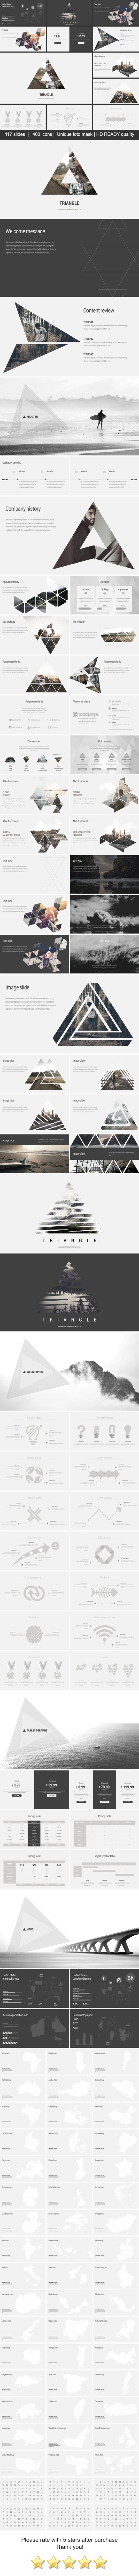 Triangle Minimal GoogleSlides Template — Google Slides PPTX #marketing #niches • Download ➝ https://graphicriver.net/item/triangle-minimal-googleslides-template/18885419?ref=pxcr